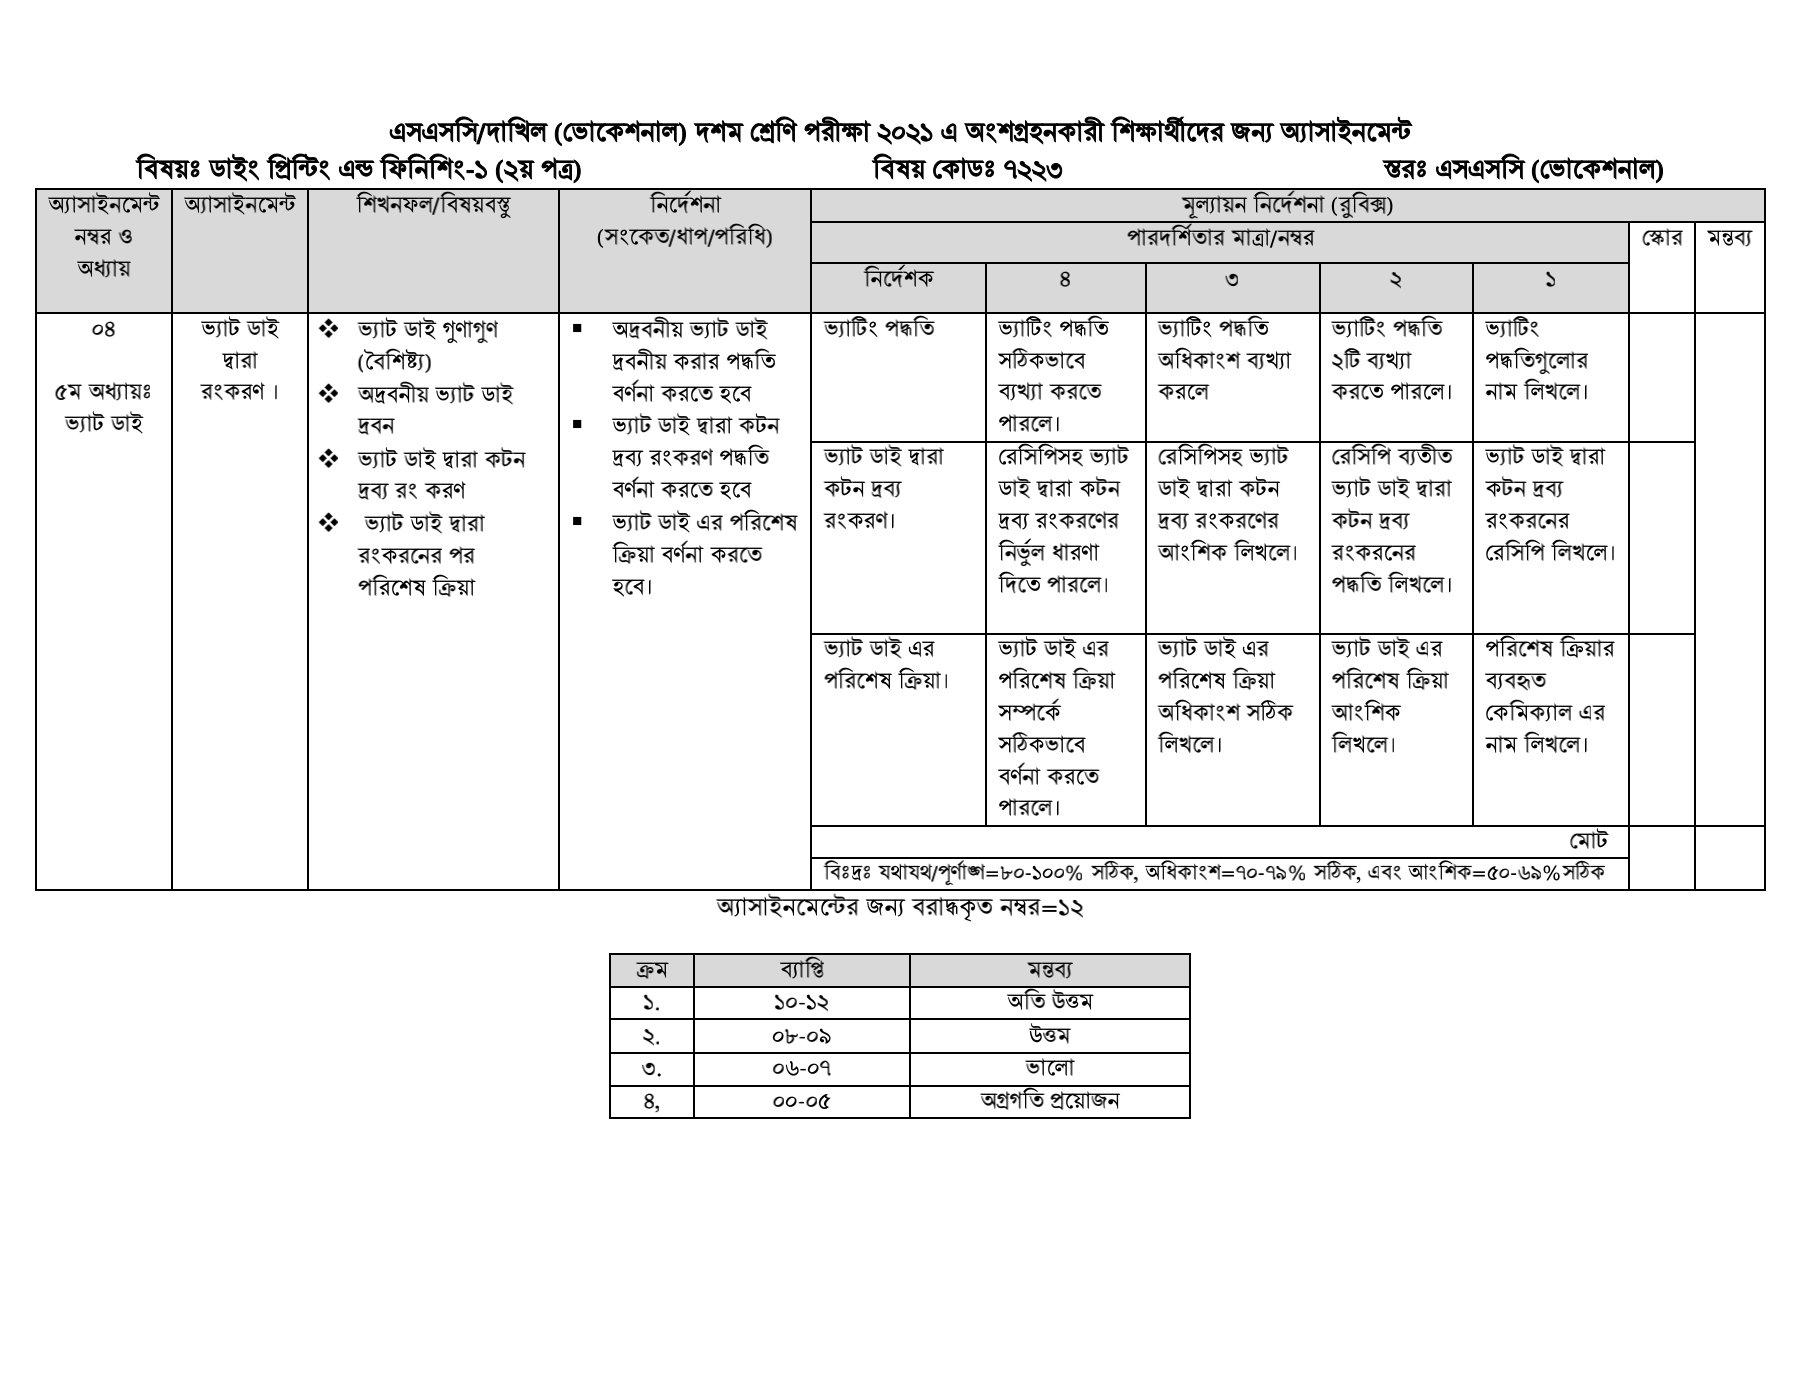 SSC / Dakhil (Vocational) 9th-10th class assignment solution / Answer 2021 3rd week 12